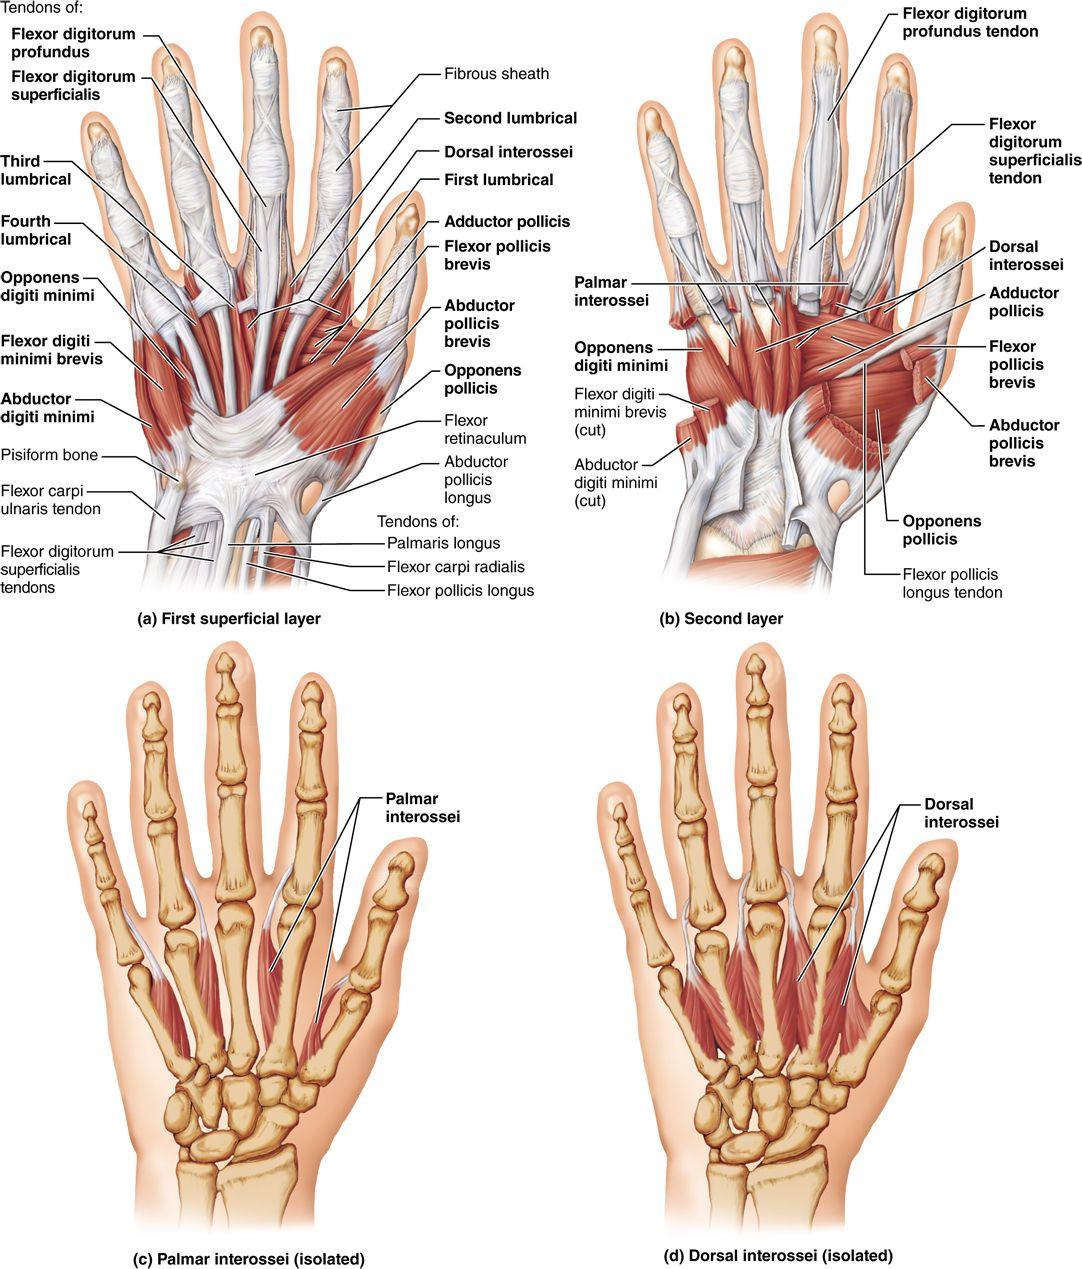 Human Hand Anatomy | Hand anatomy, Anatomy bones, Human body anatomy